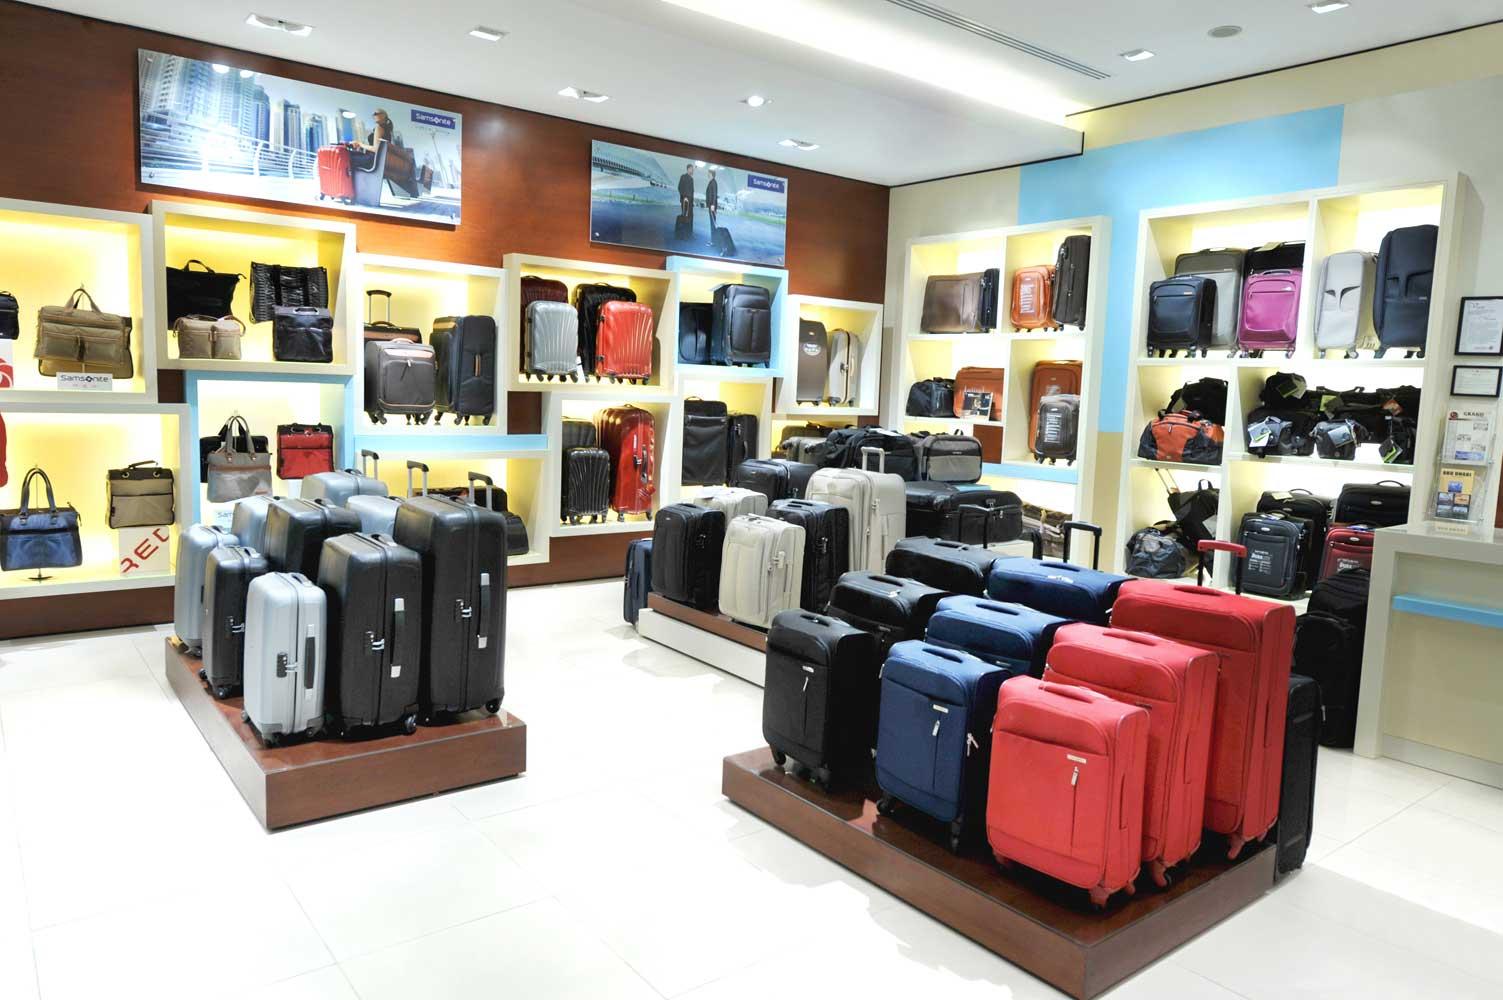 Samsung and Samsonite team up to develop smart suitcases - SamMobile